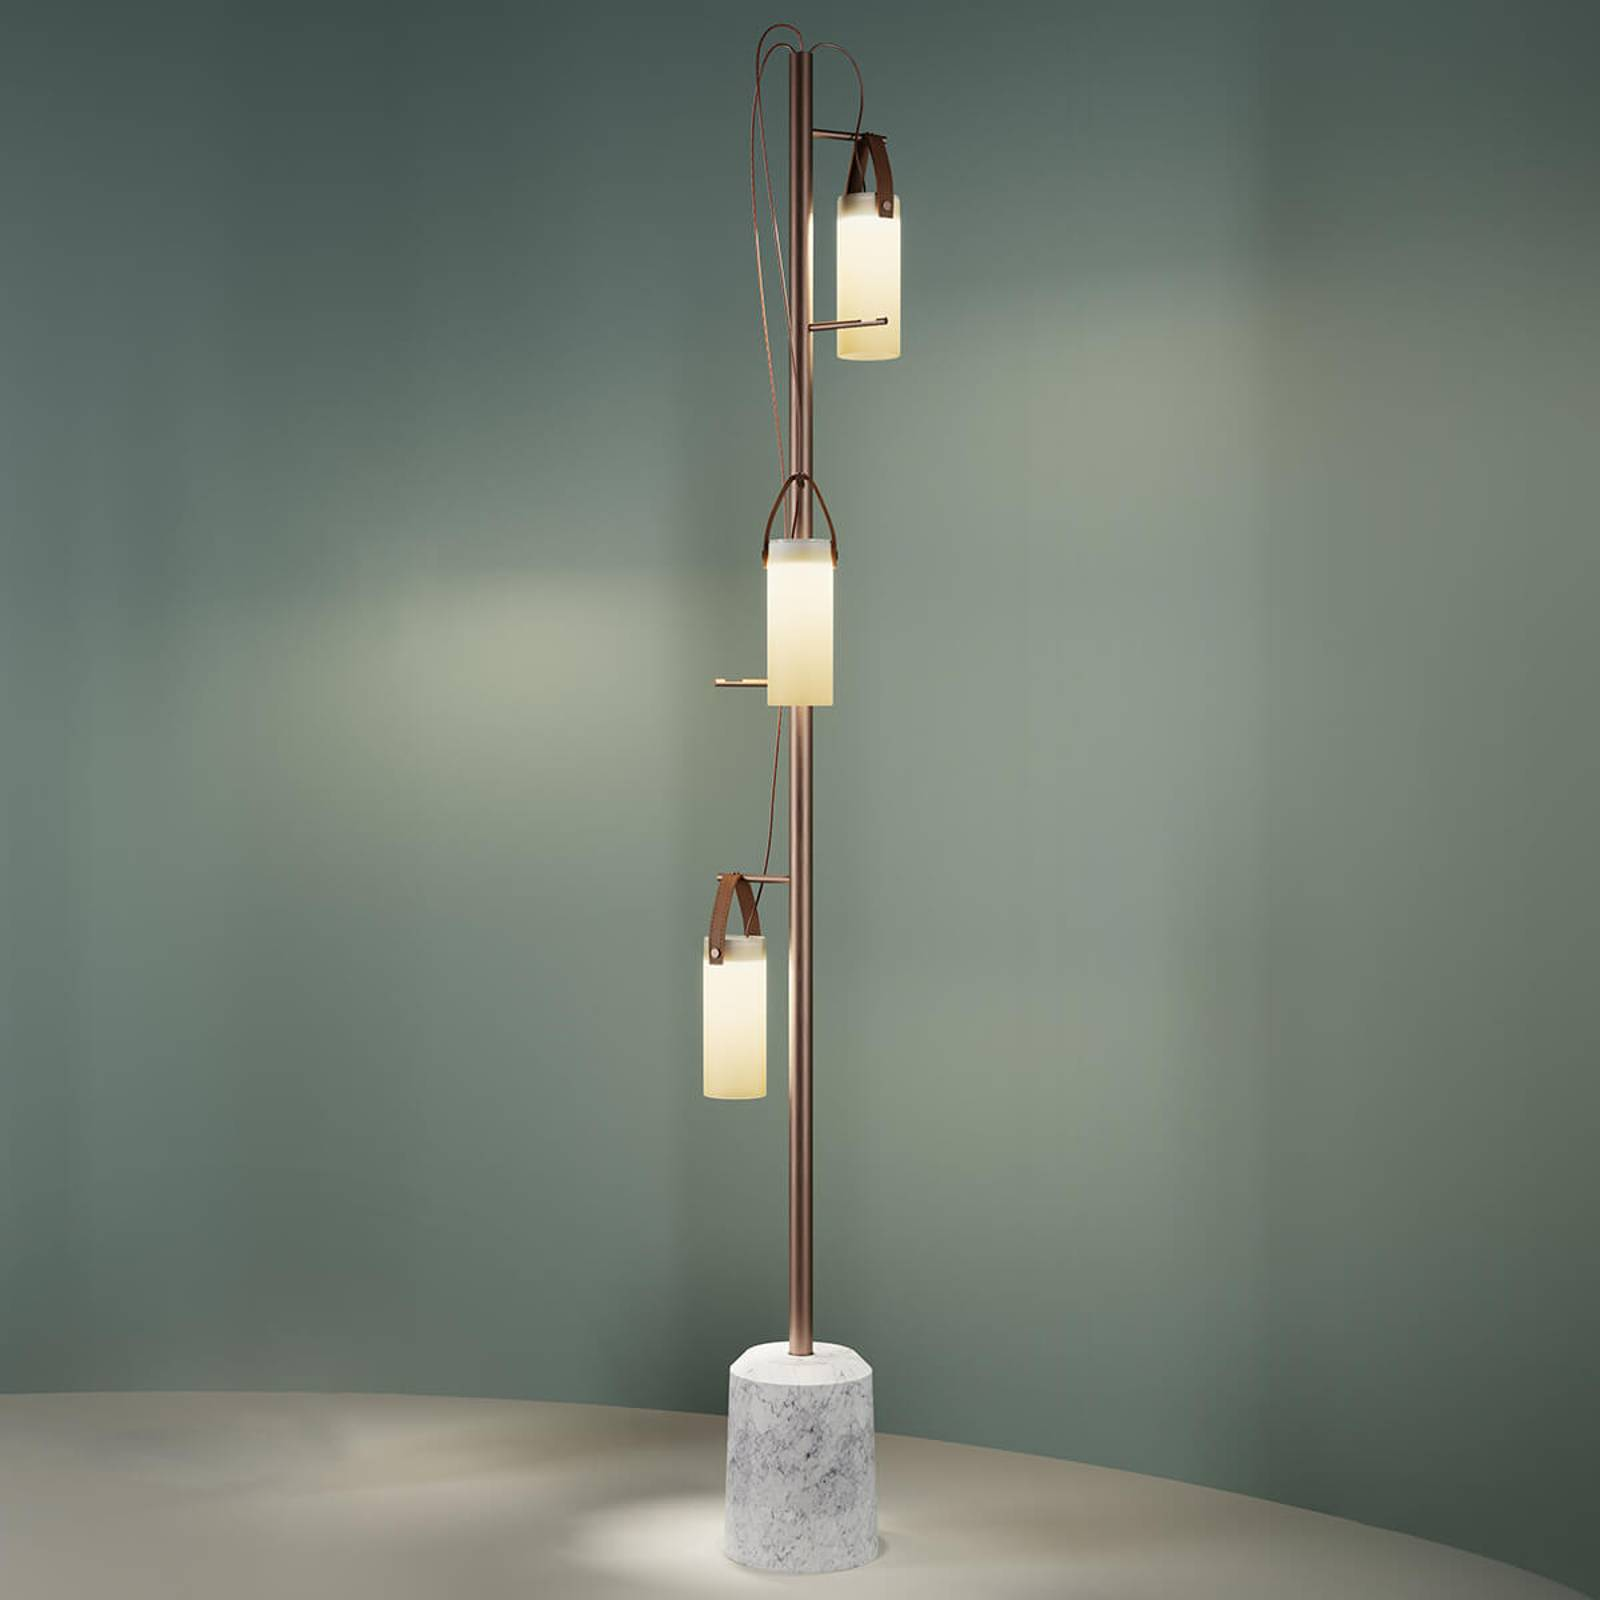 LED design vloerlamp Galerie met 3 lampen